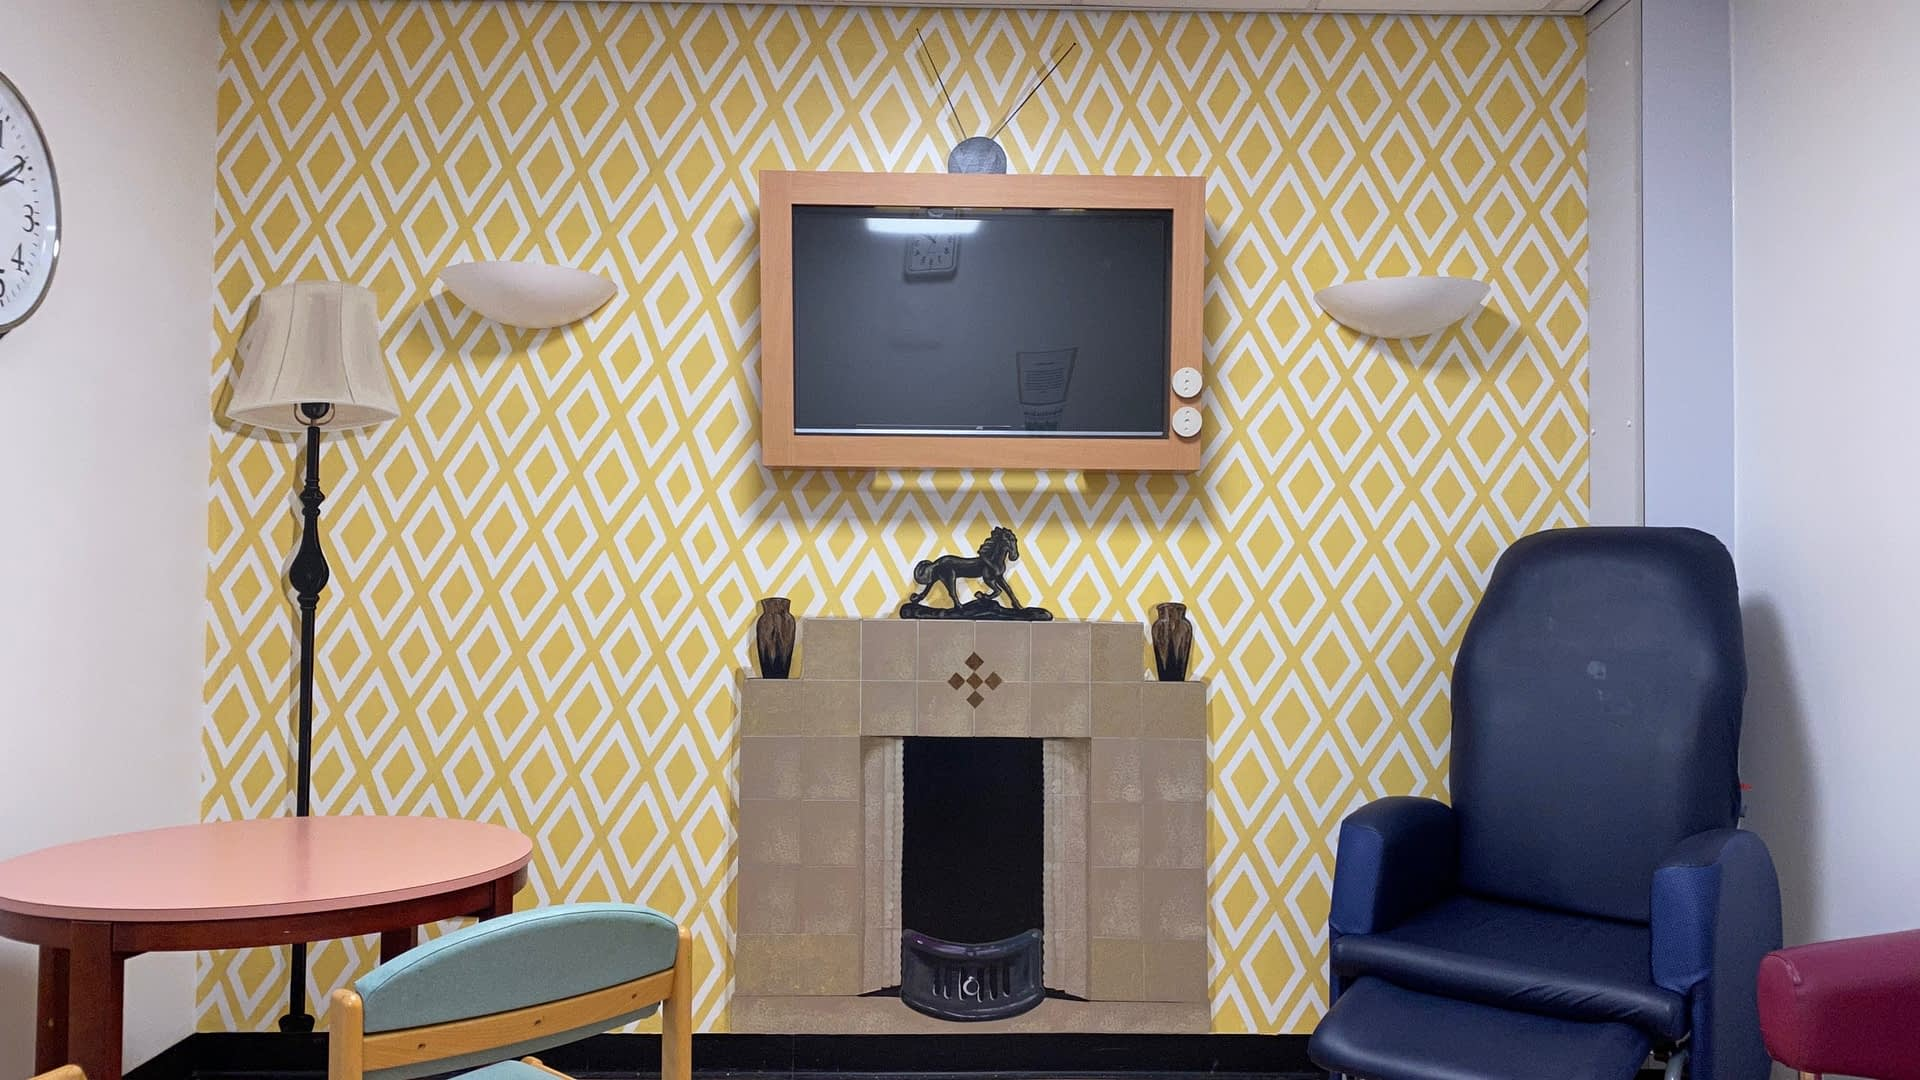 Dementia Ward, Hospital Day Room